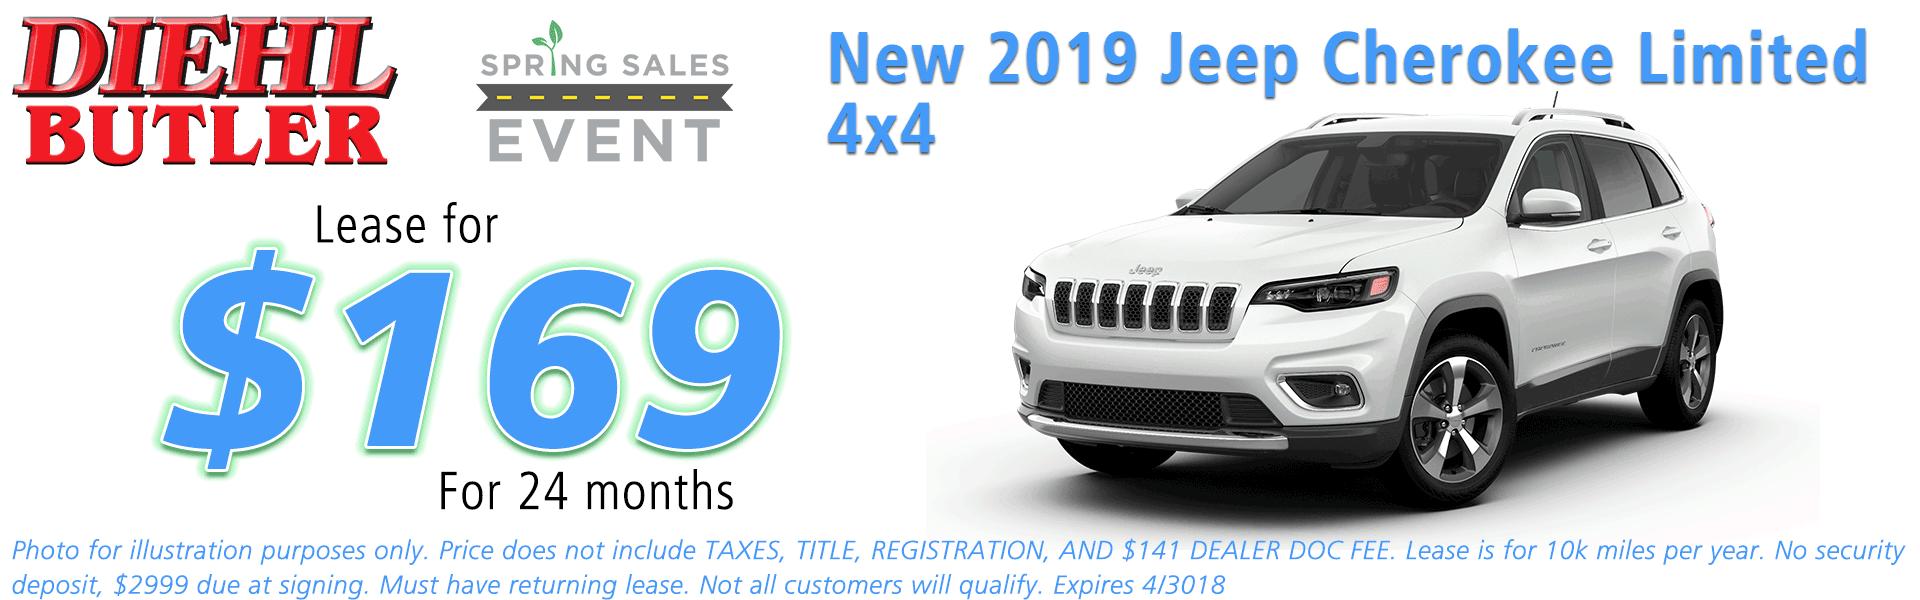 NEW 2019 JEEP CHEROKEE LIMITED 4X4 Diehl of Butler Chrysler Jeep Dodge Ram Toyota Volkswagen 258 Pittsburgh Road Butler PA 16002